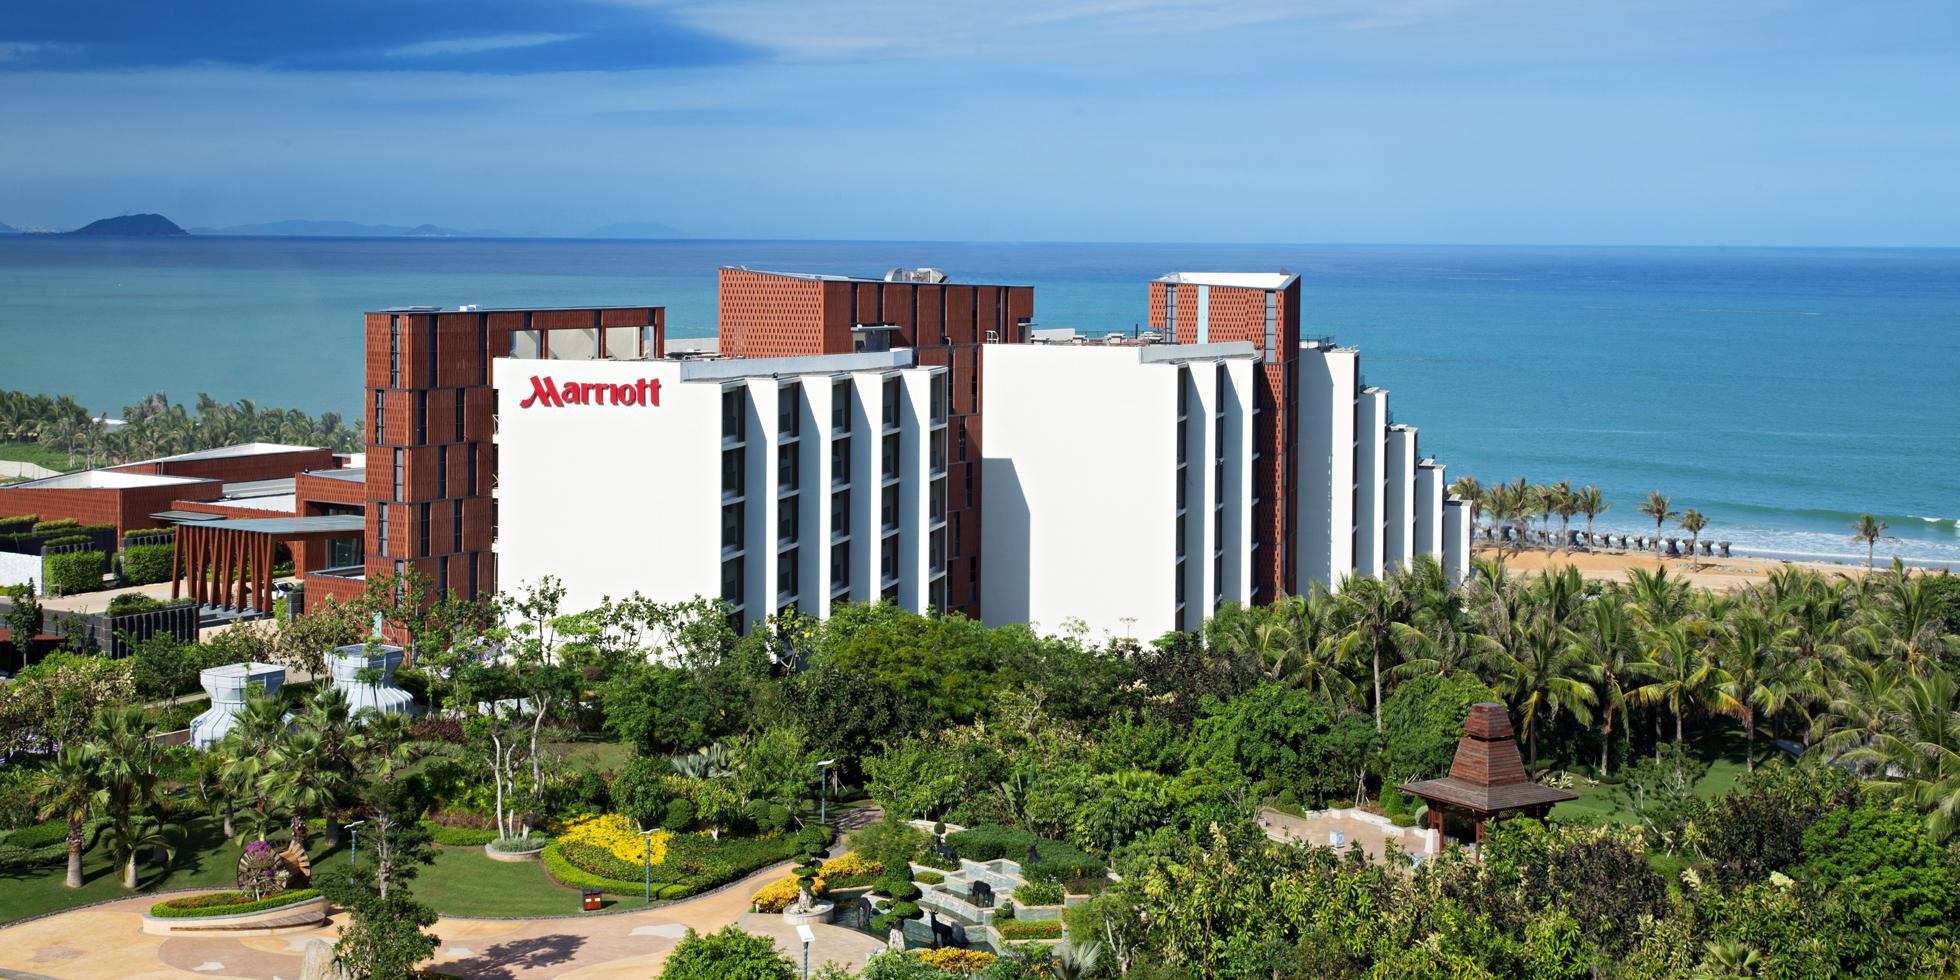 Marriott Hotels Yuba City Ca